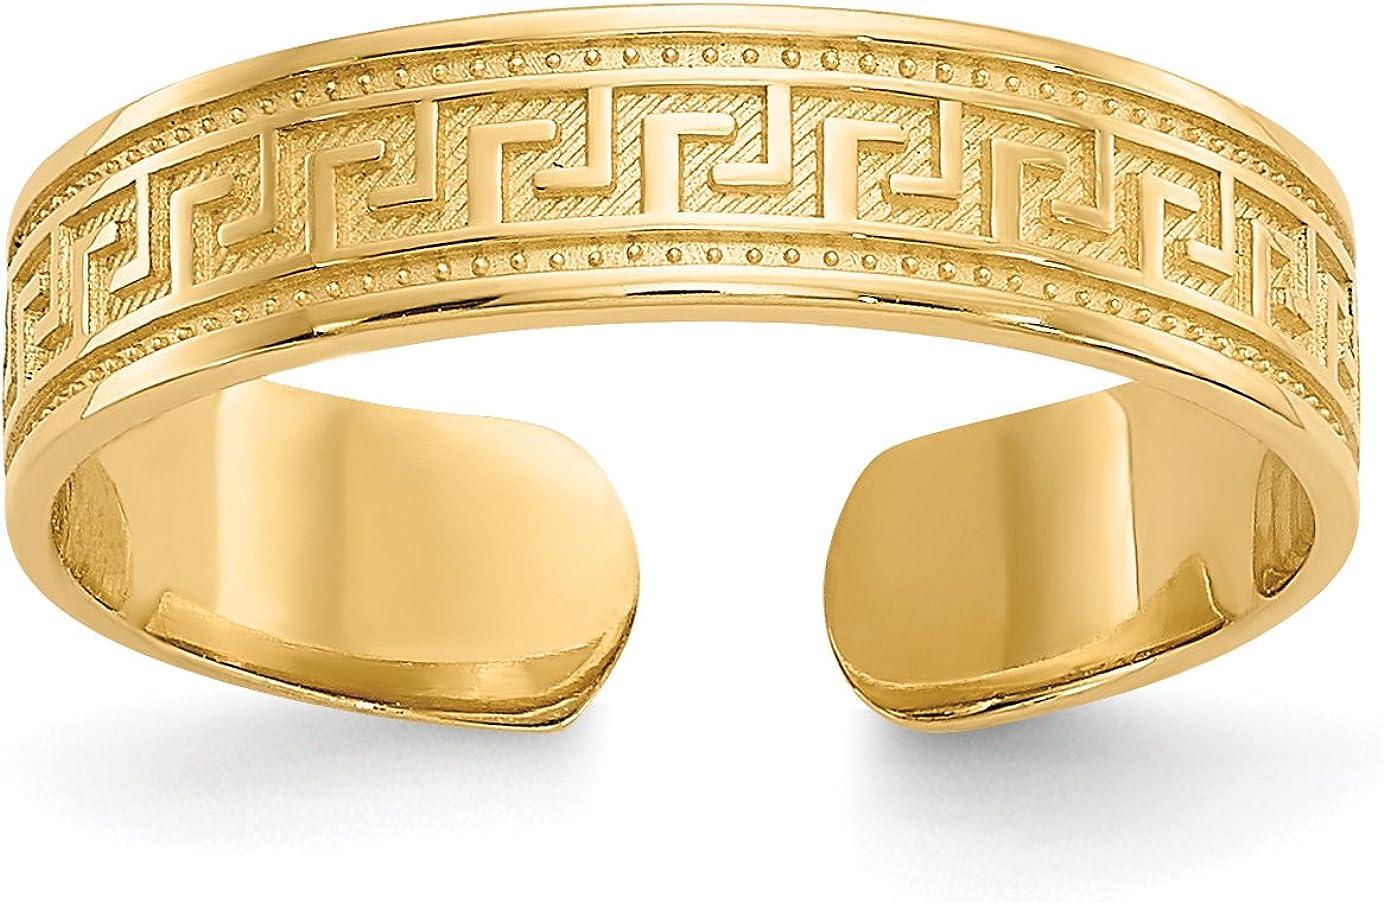 14k Yellow Gold Greek Key Pattern on Textured Toe Ring